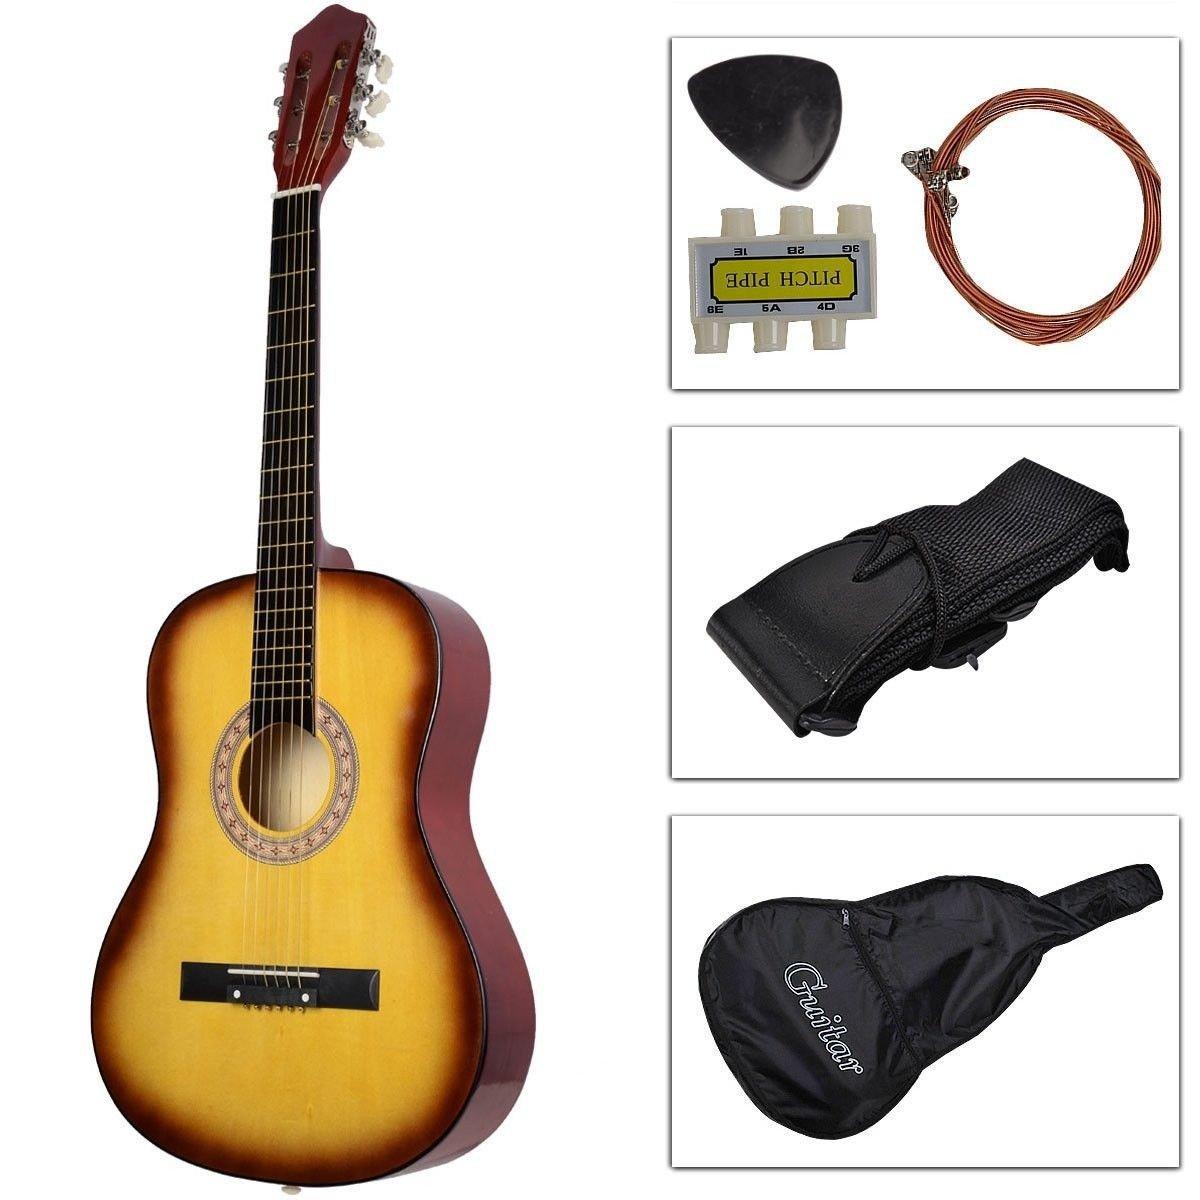 Wooden Guitar, Safeplus Multi-Color Beginners Acoustic Guitar with Guitar Case, Strap, Guitar Pick, Tuner